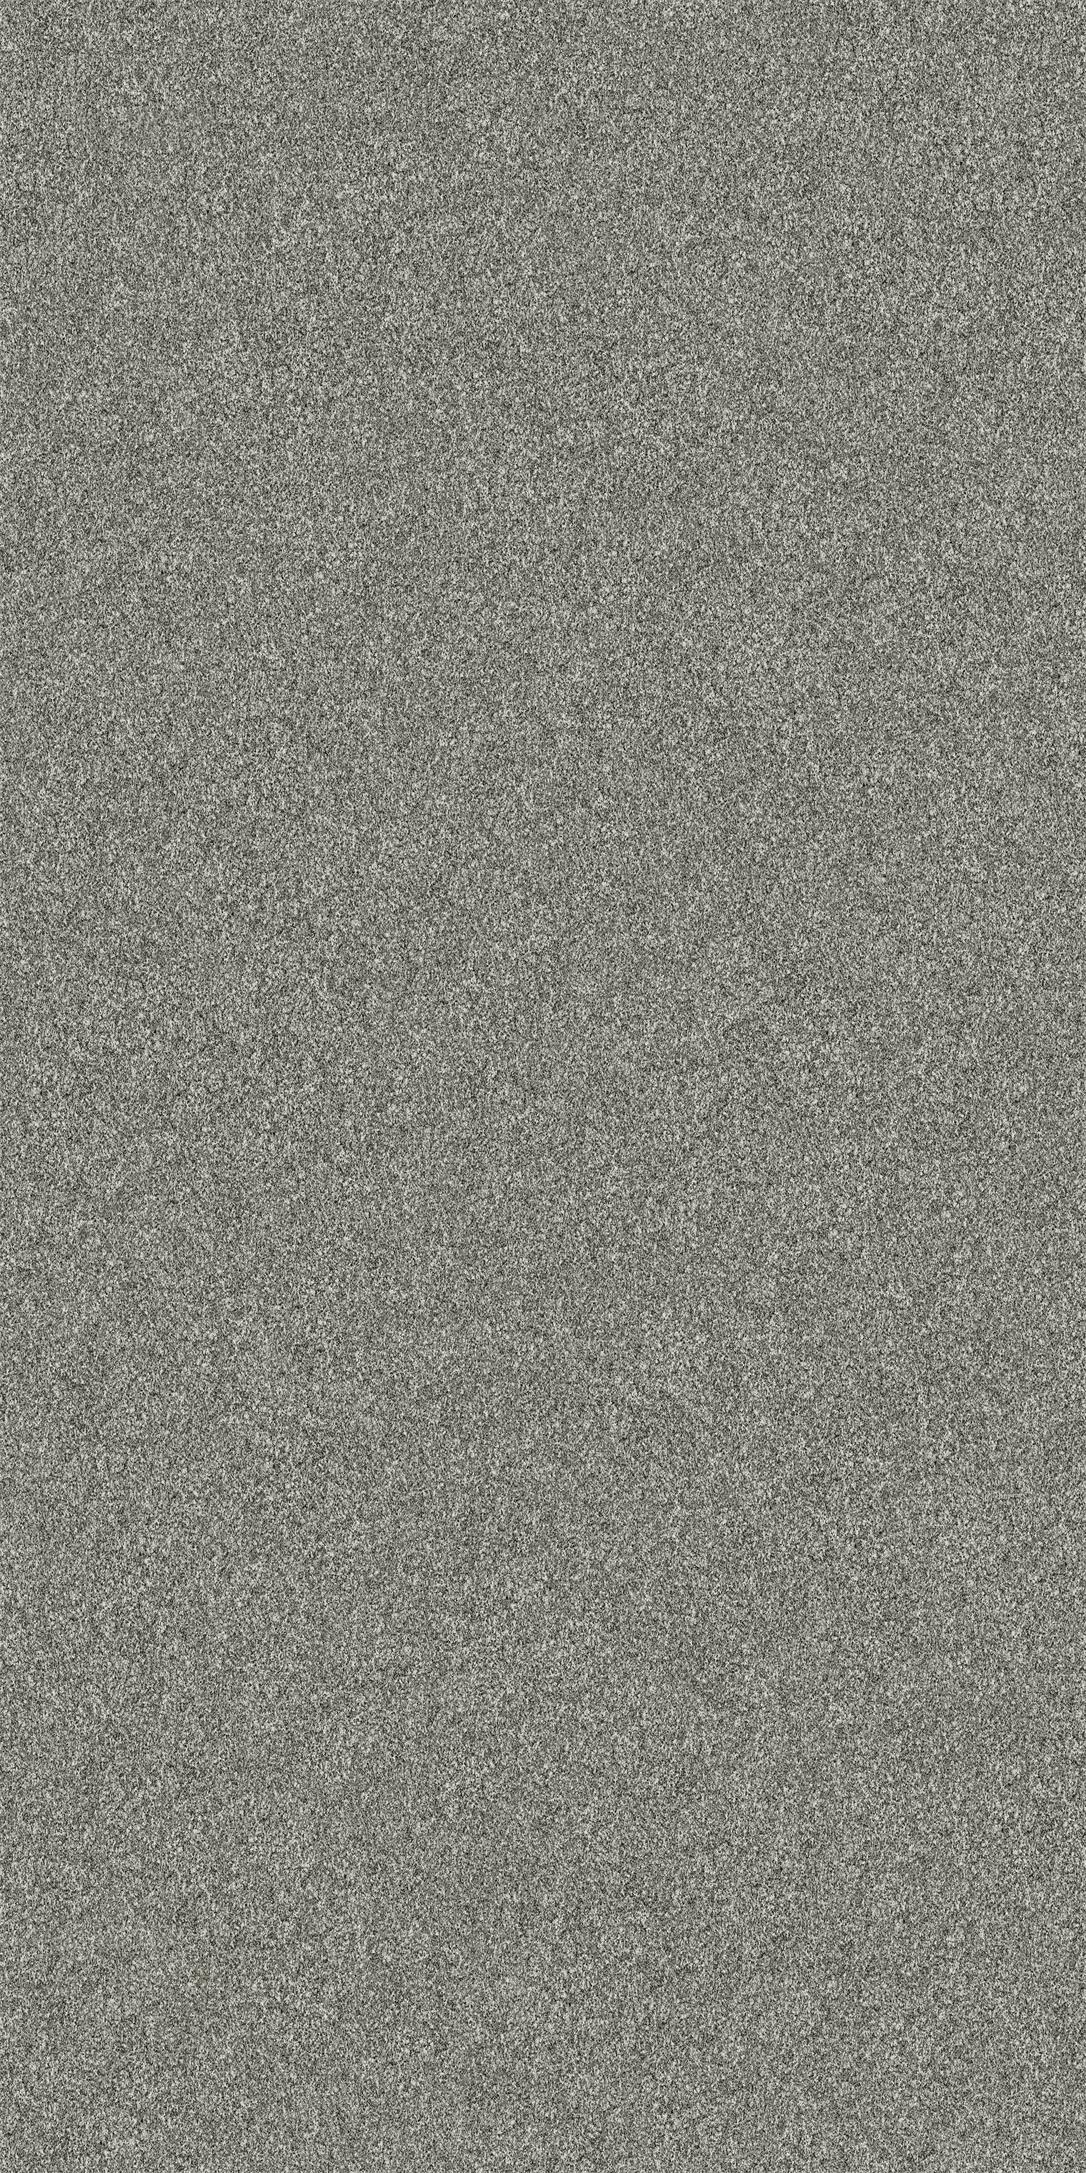 612HG02A芝麻深灰